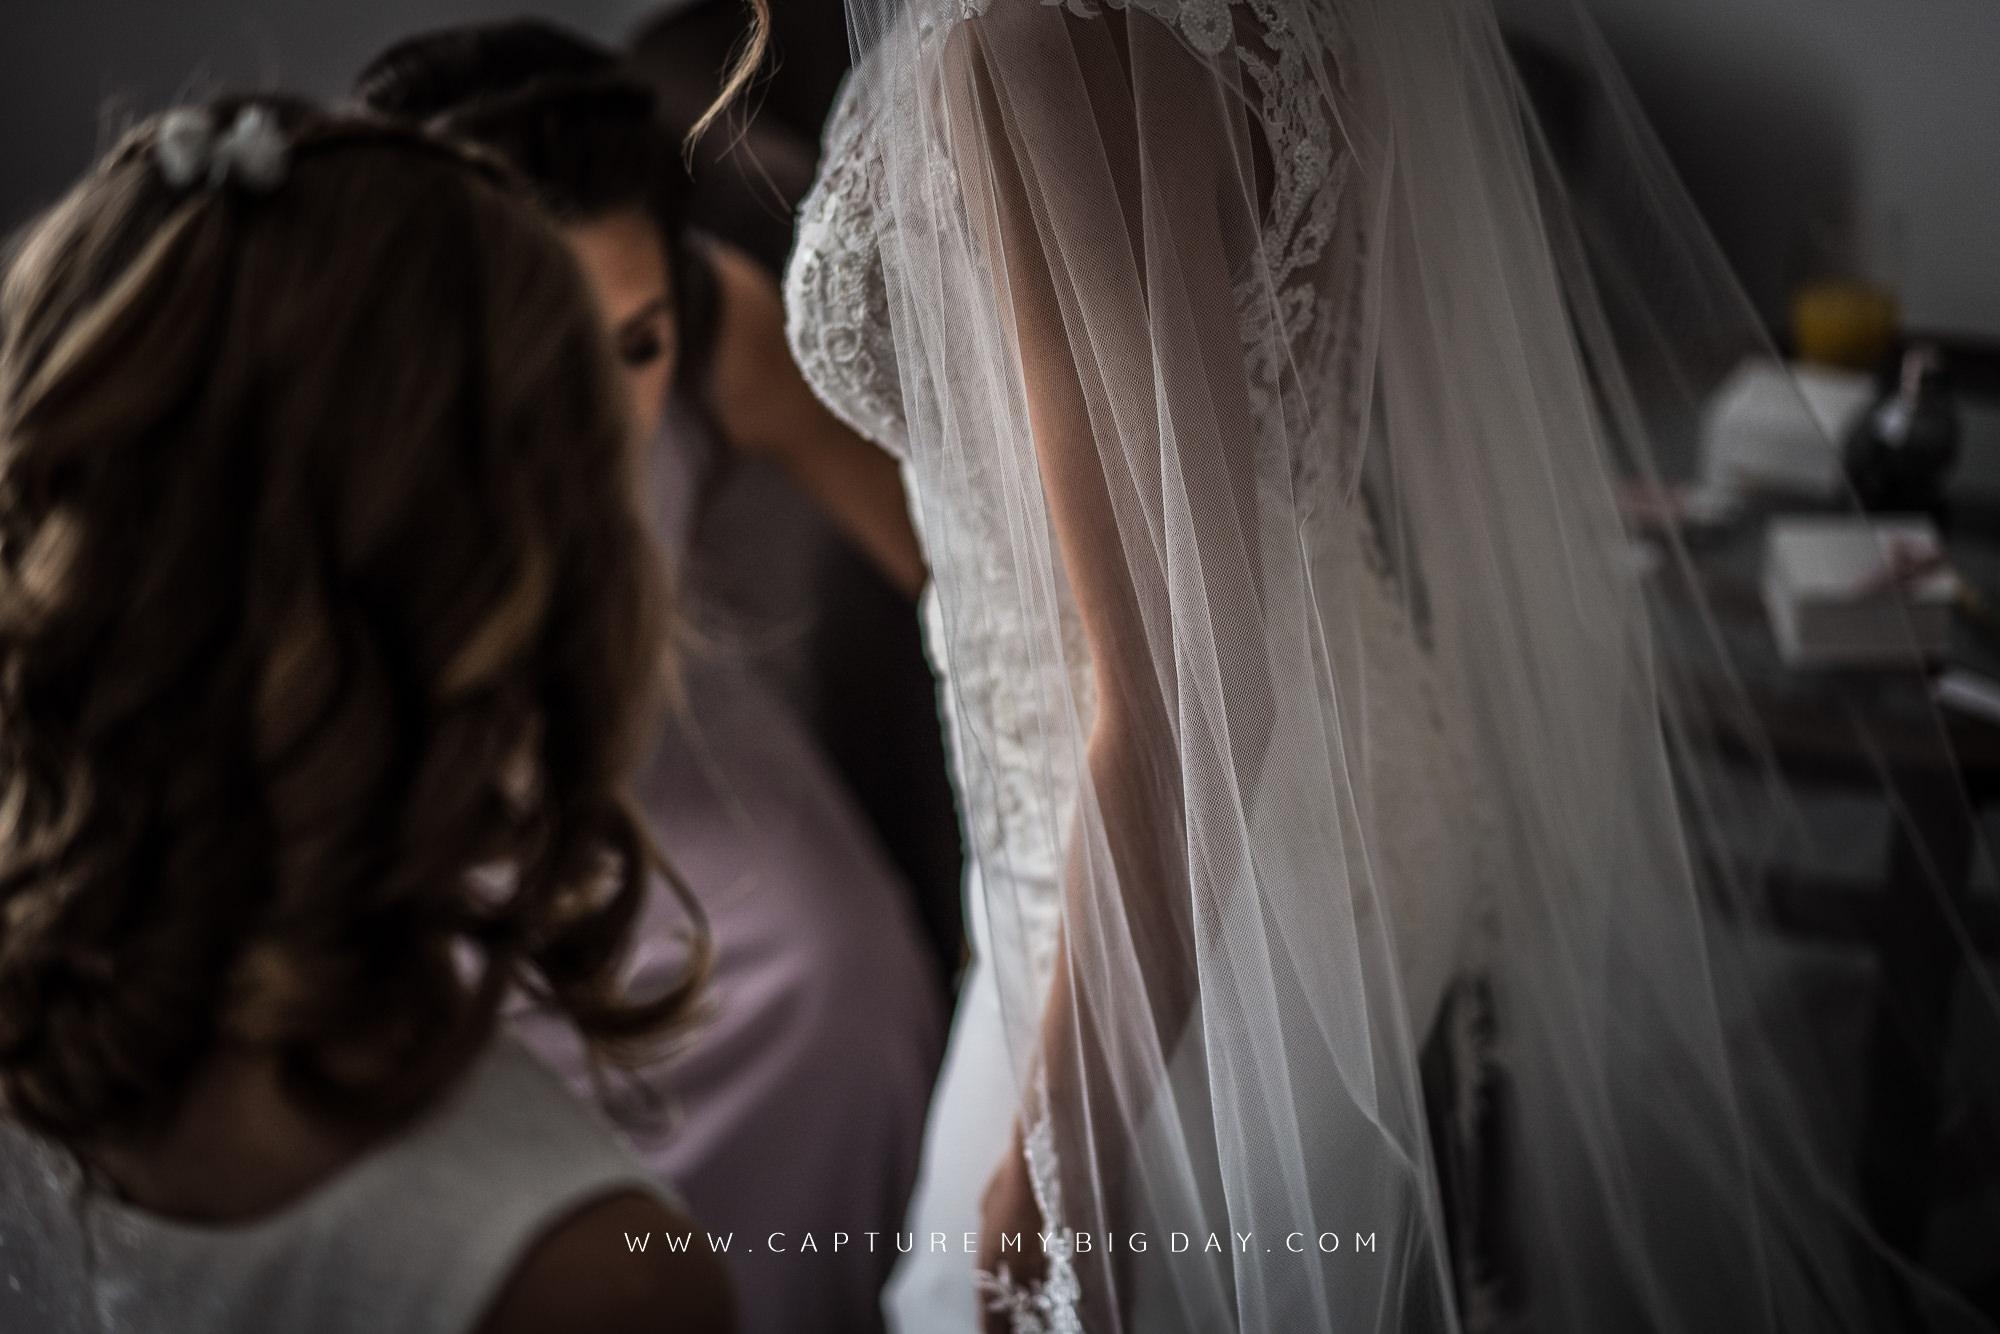 bride in wedding dress with veil